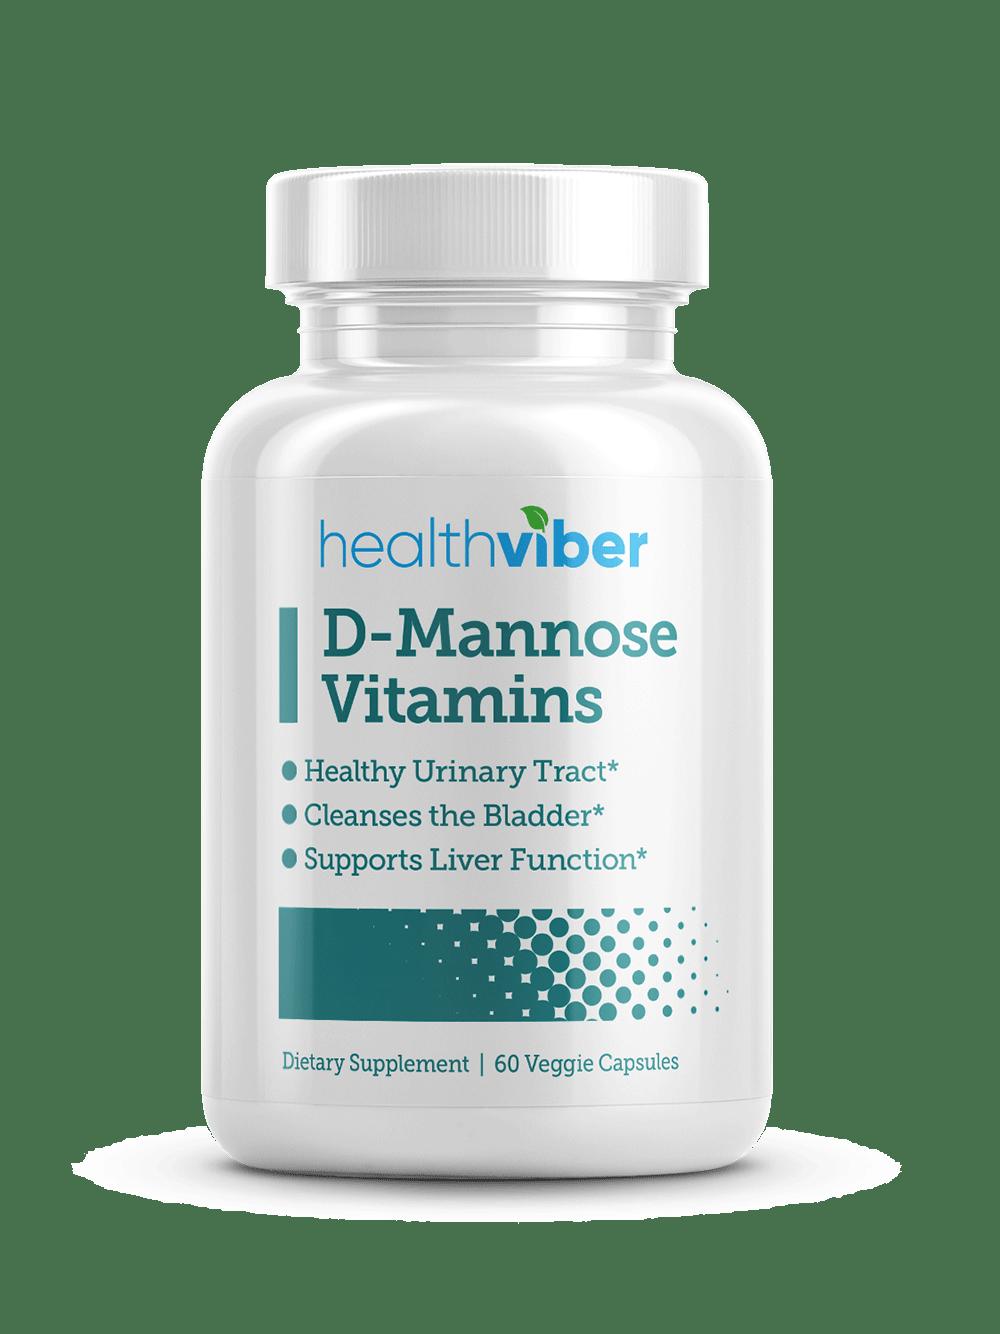 D-Mannose Vitamins